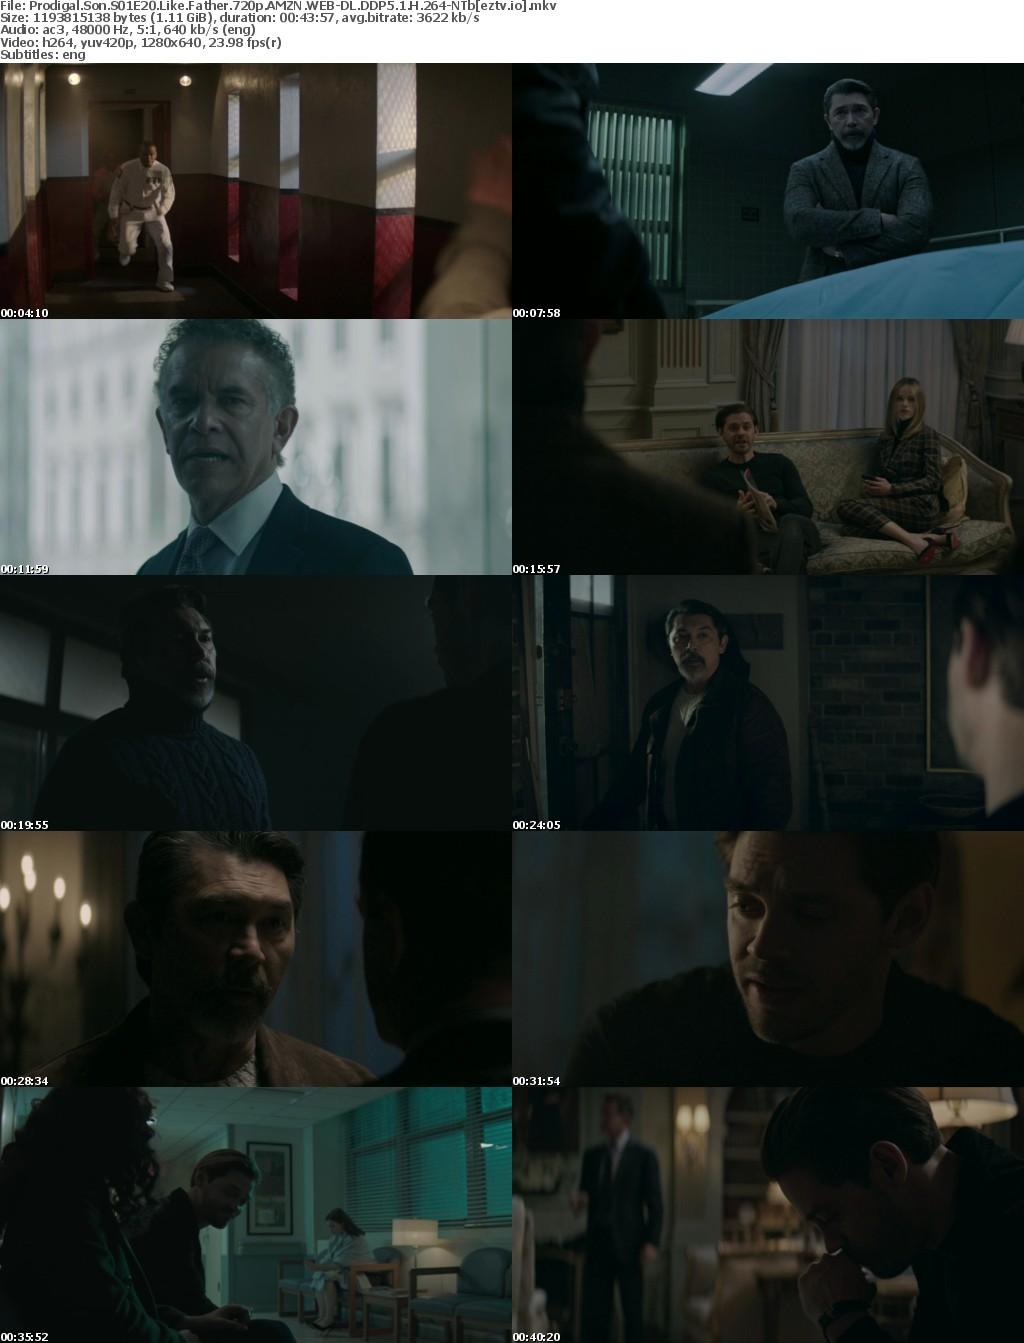 Prodigal Son S01E20 Like Father 720p AMZN WEB-DL DDP5 1 H 264-NTb